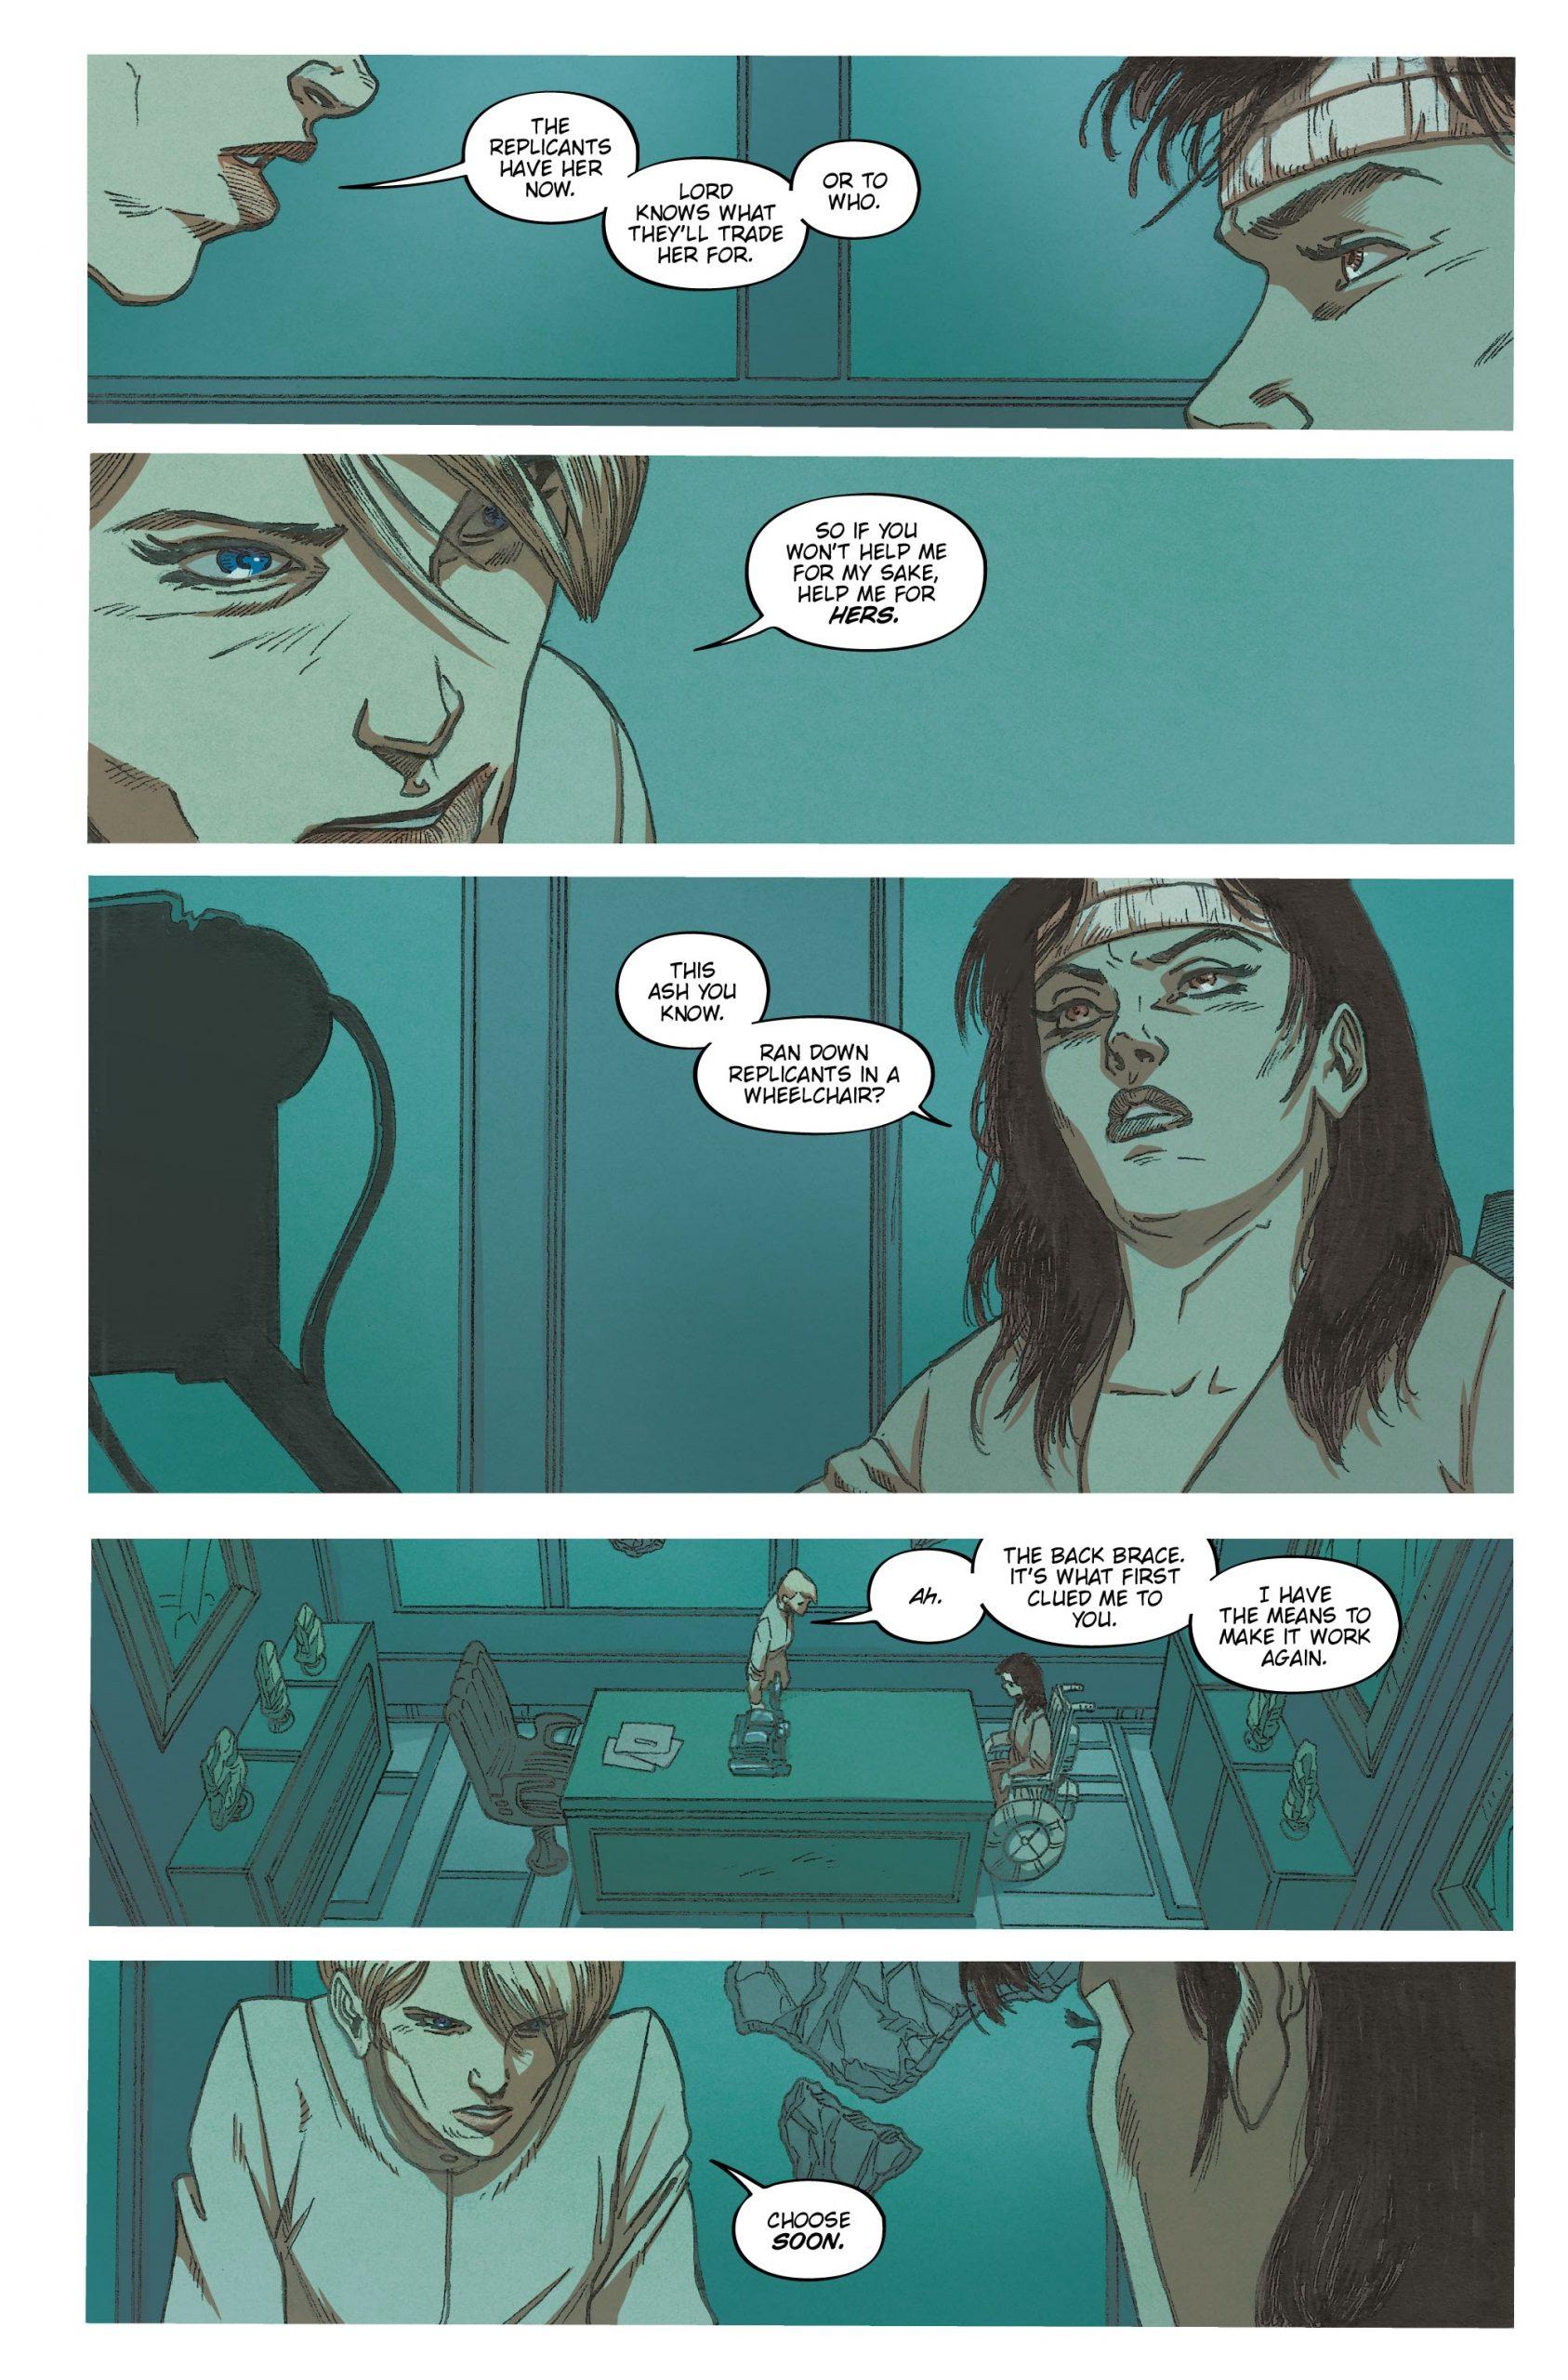 Hythe interrogates Ash